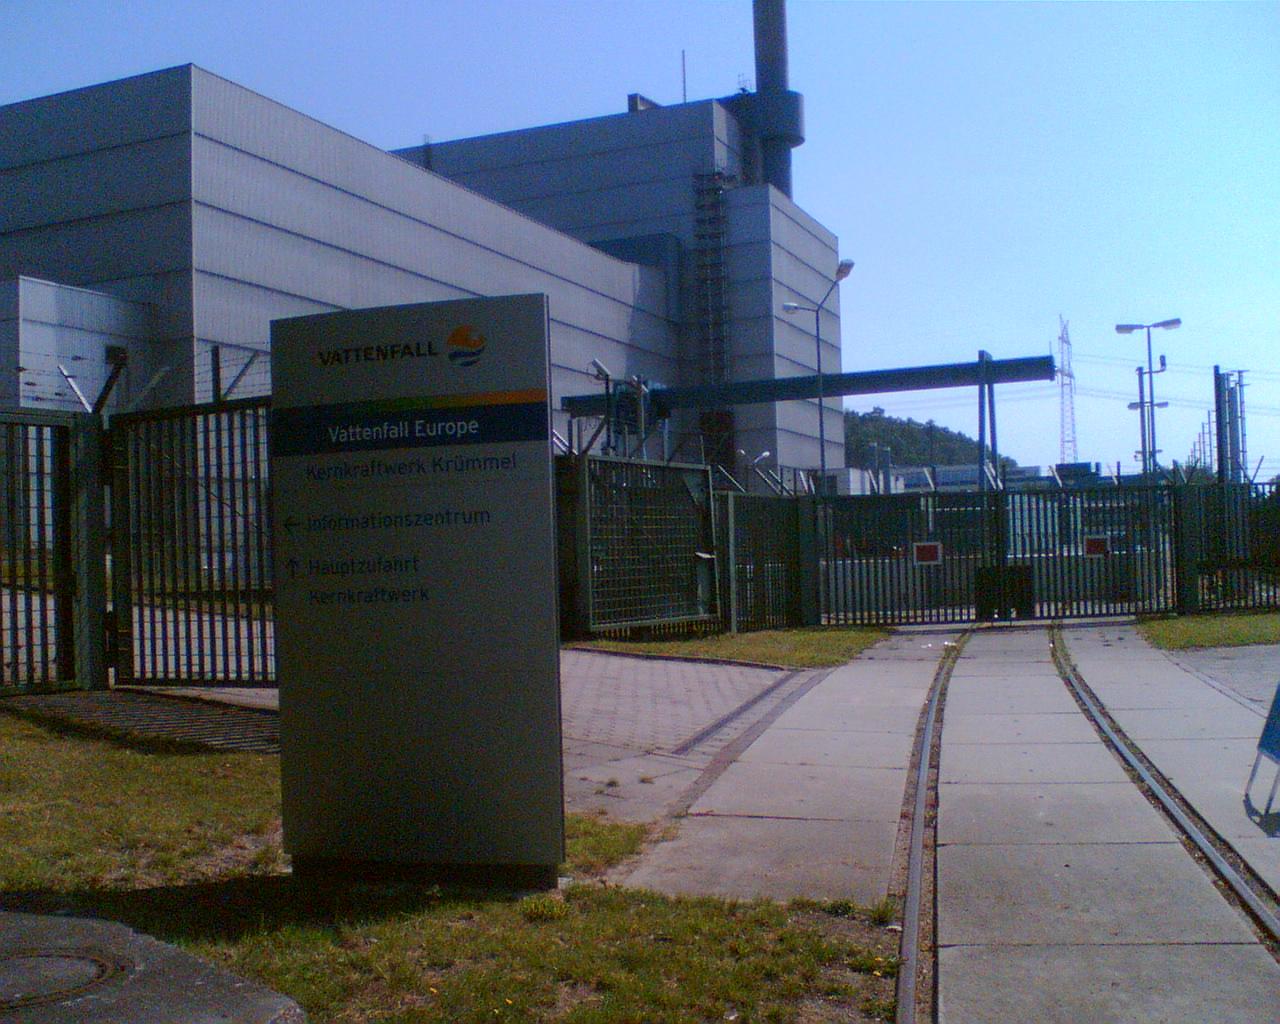 KKW Kernkraftwerk Krümmel - AKW Atomkraftwerk Krümmel